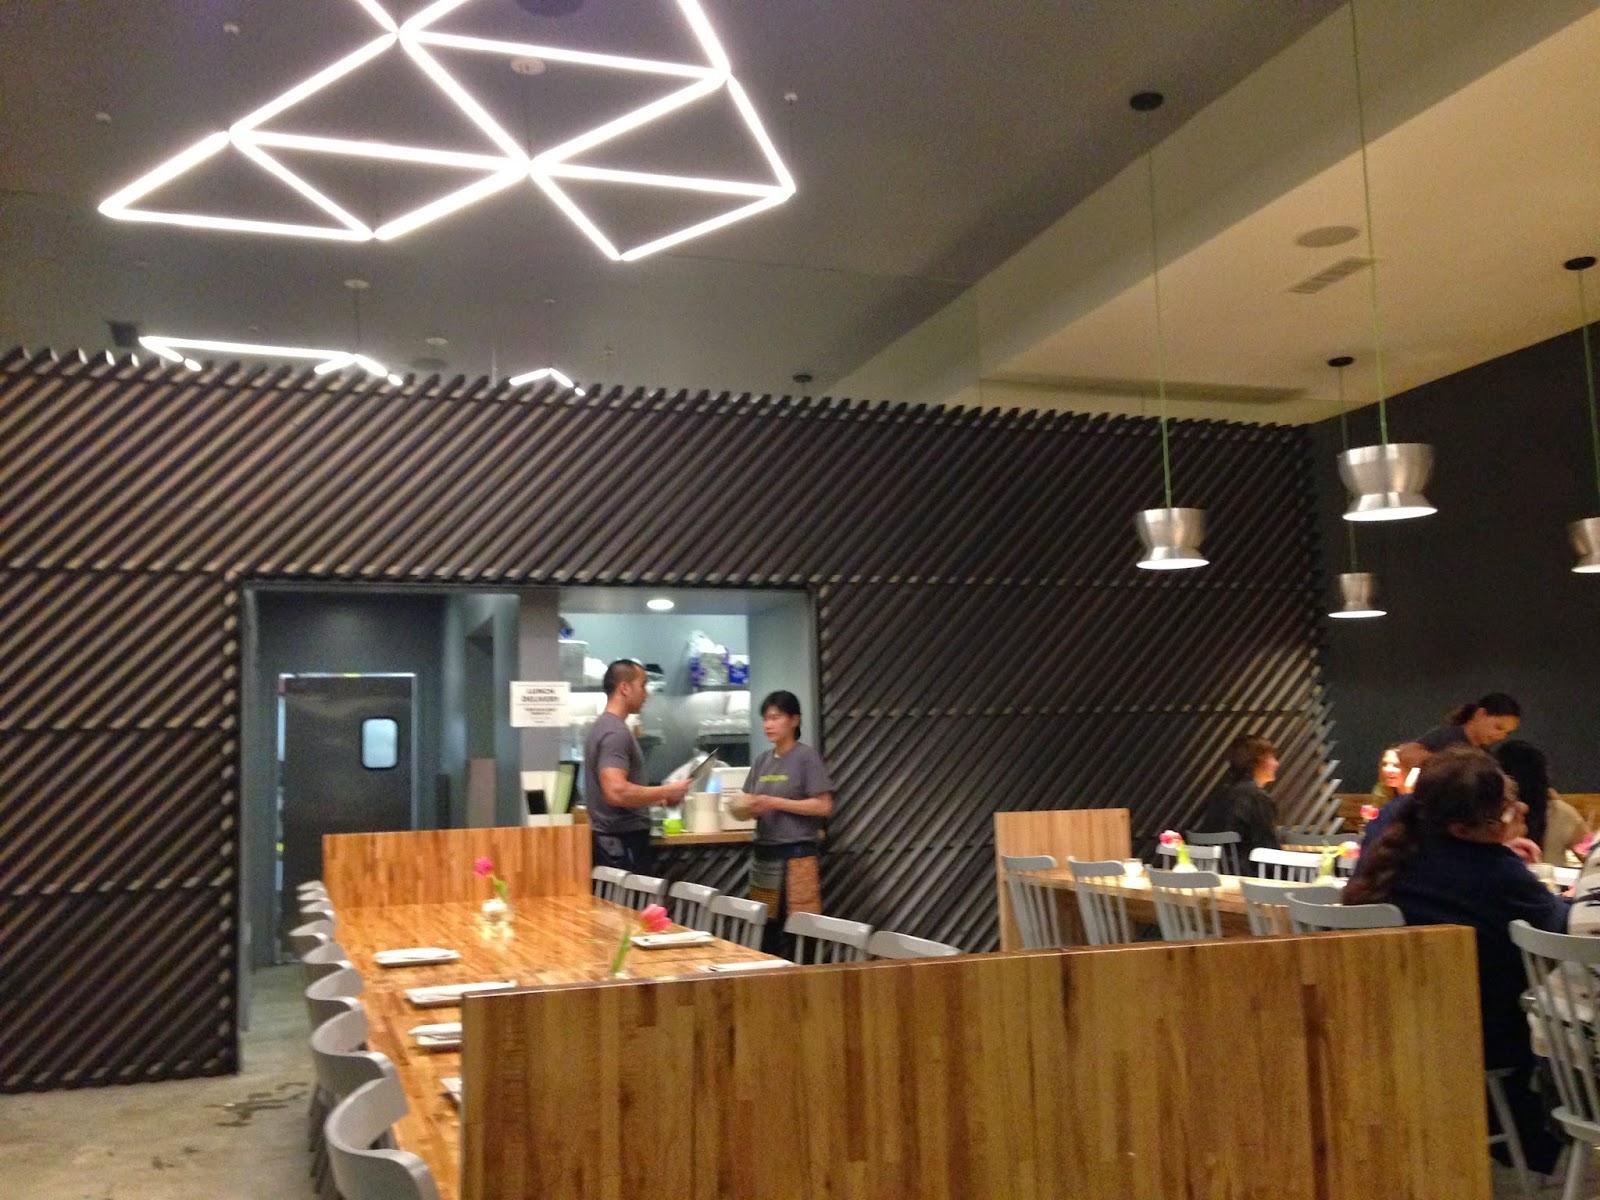 CAFE LA LA Manaow in Long Beach